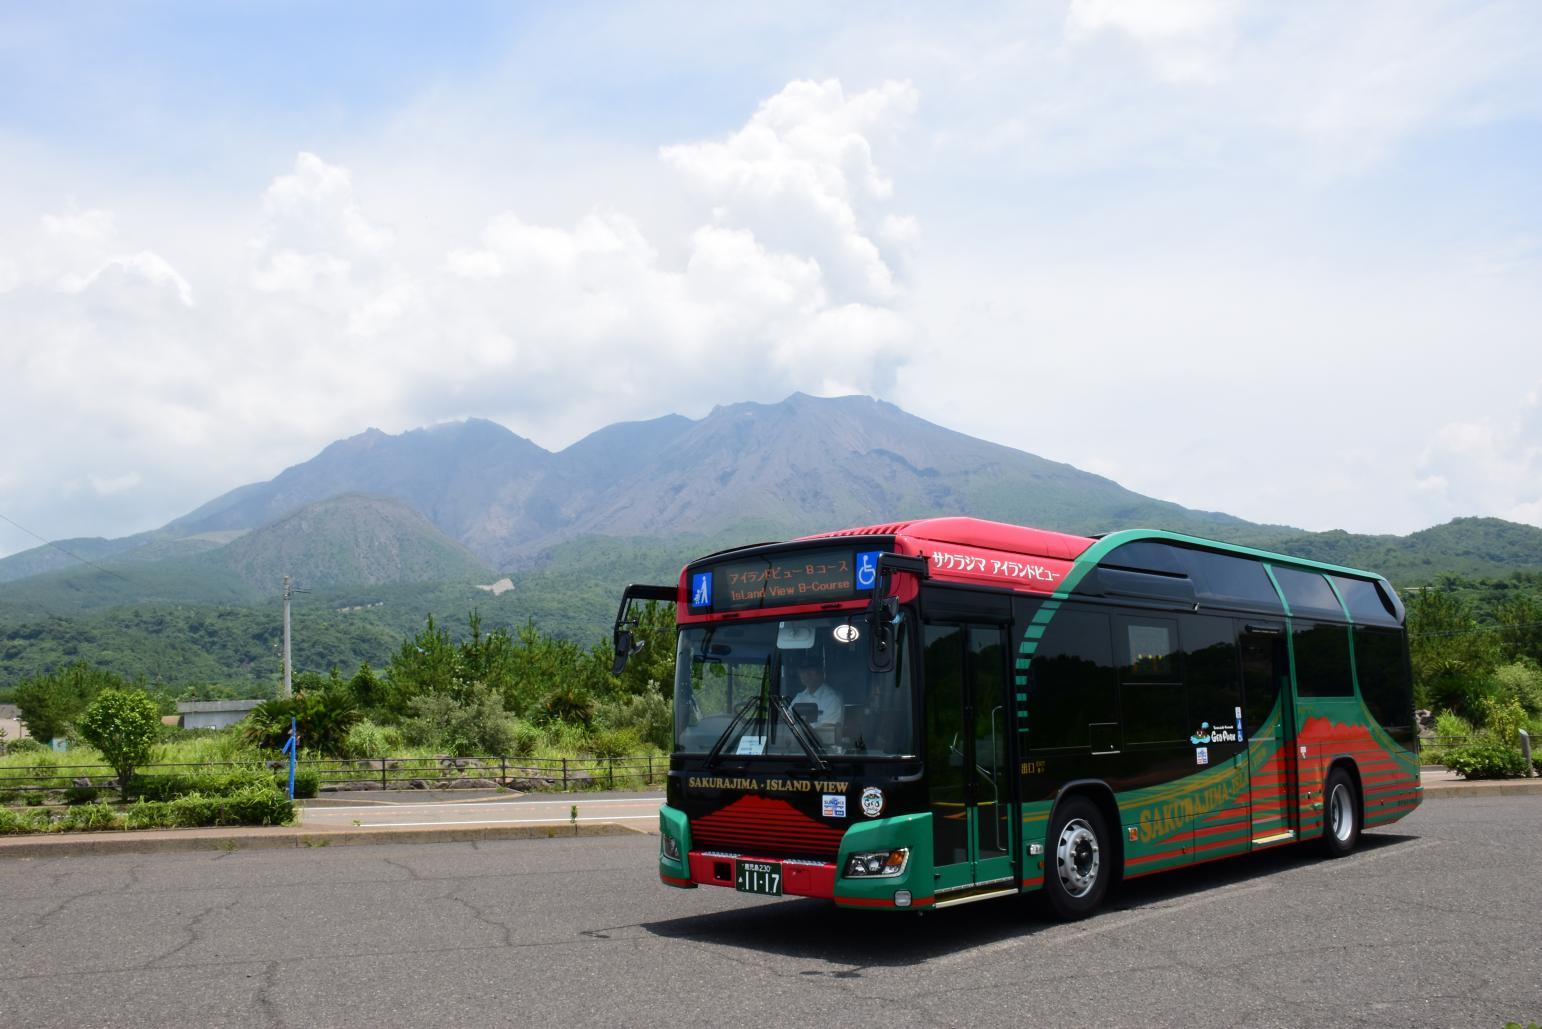 Sakurajima Island View buses-1